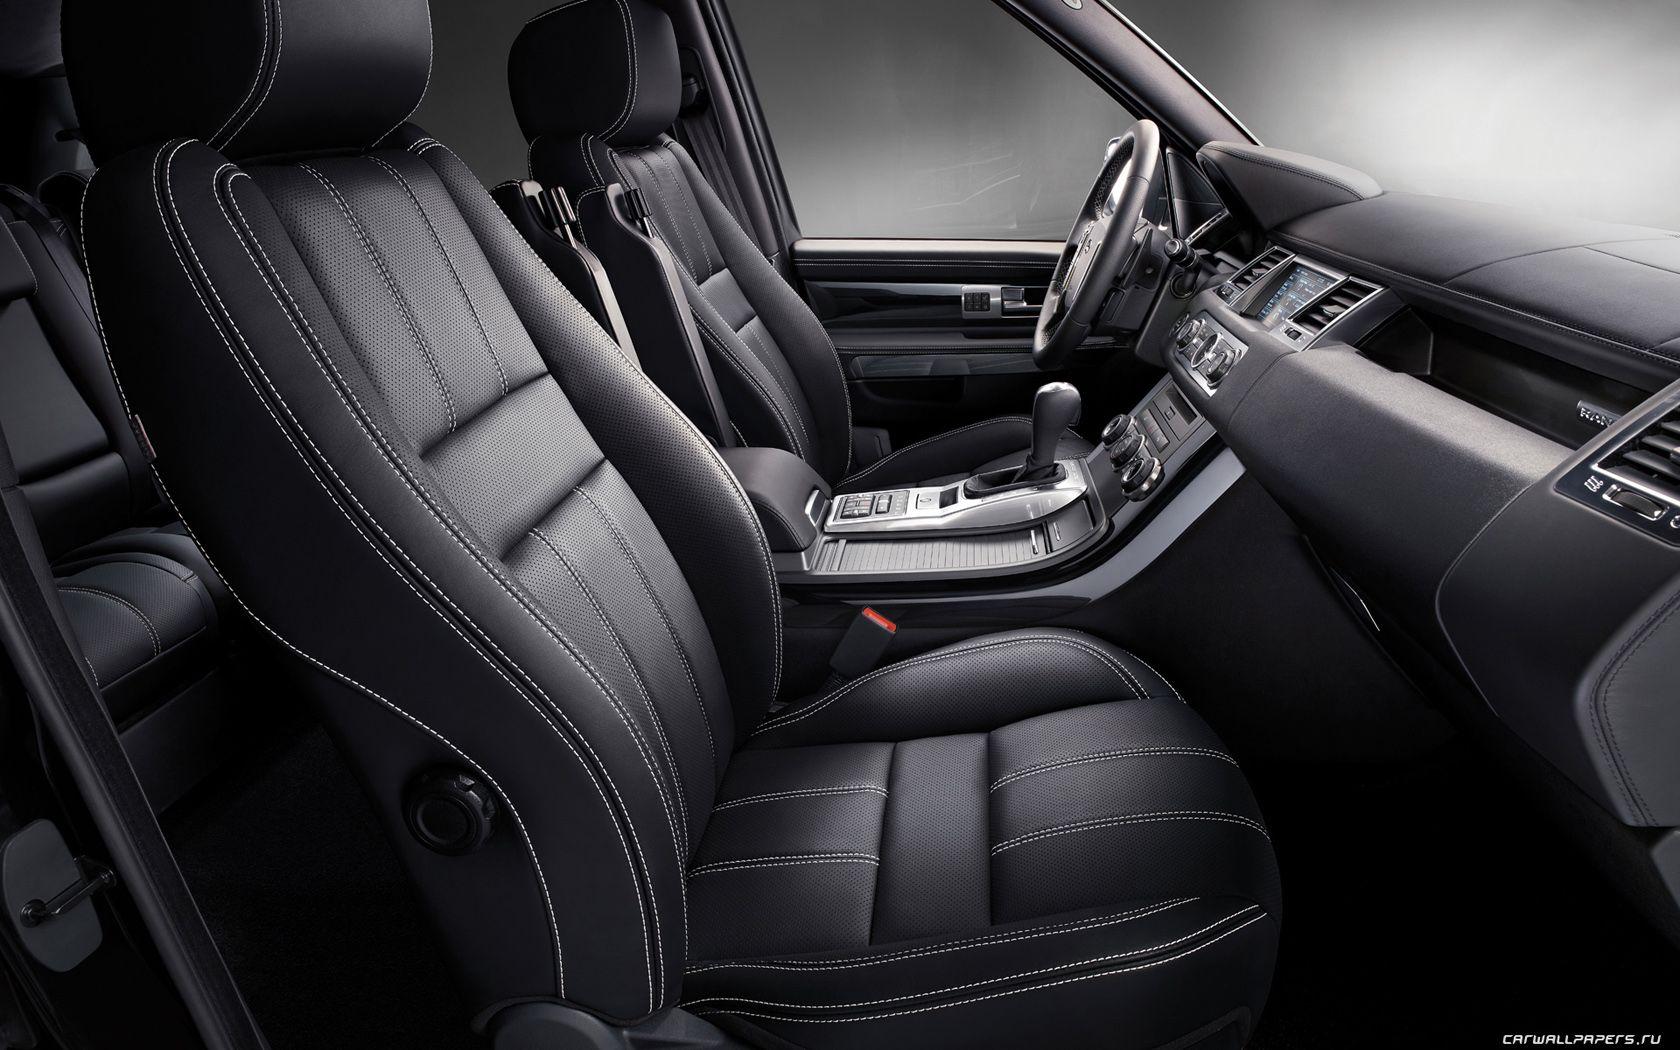 2012 Range Rover Sport Interior Range Rover Sport Range Rover Range Rover Supercharged